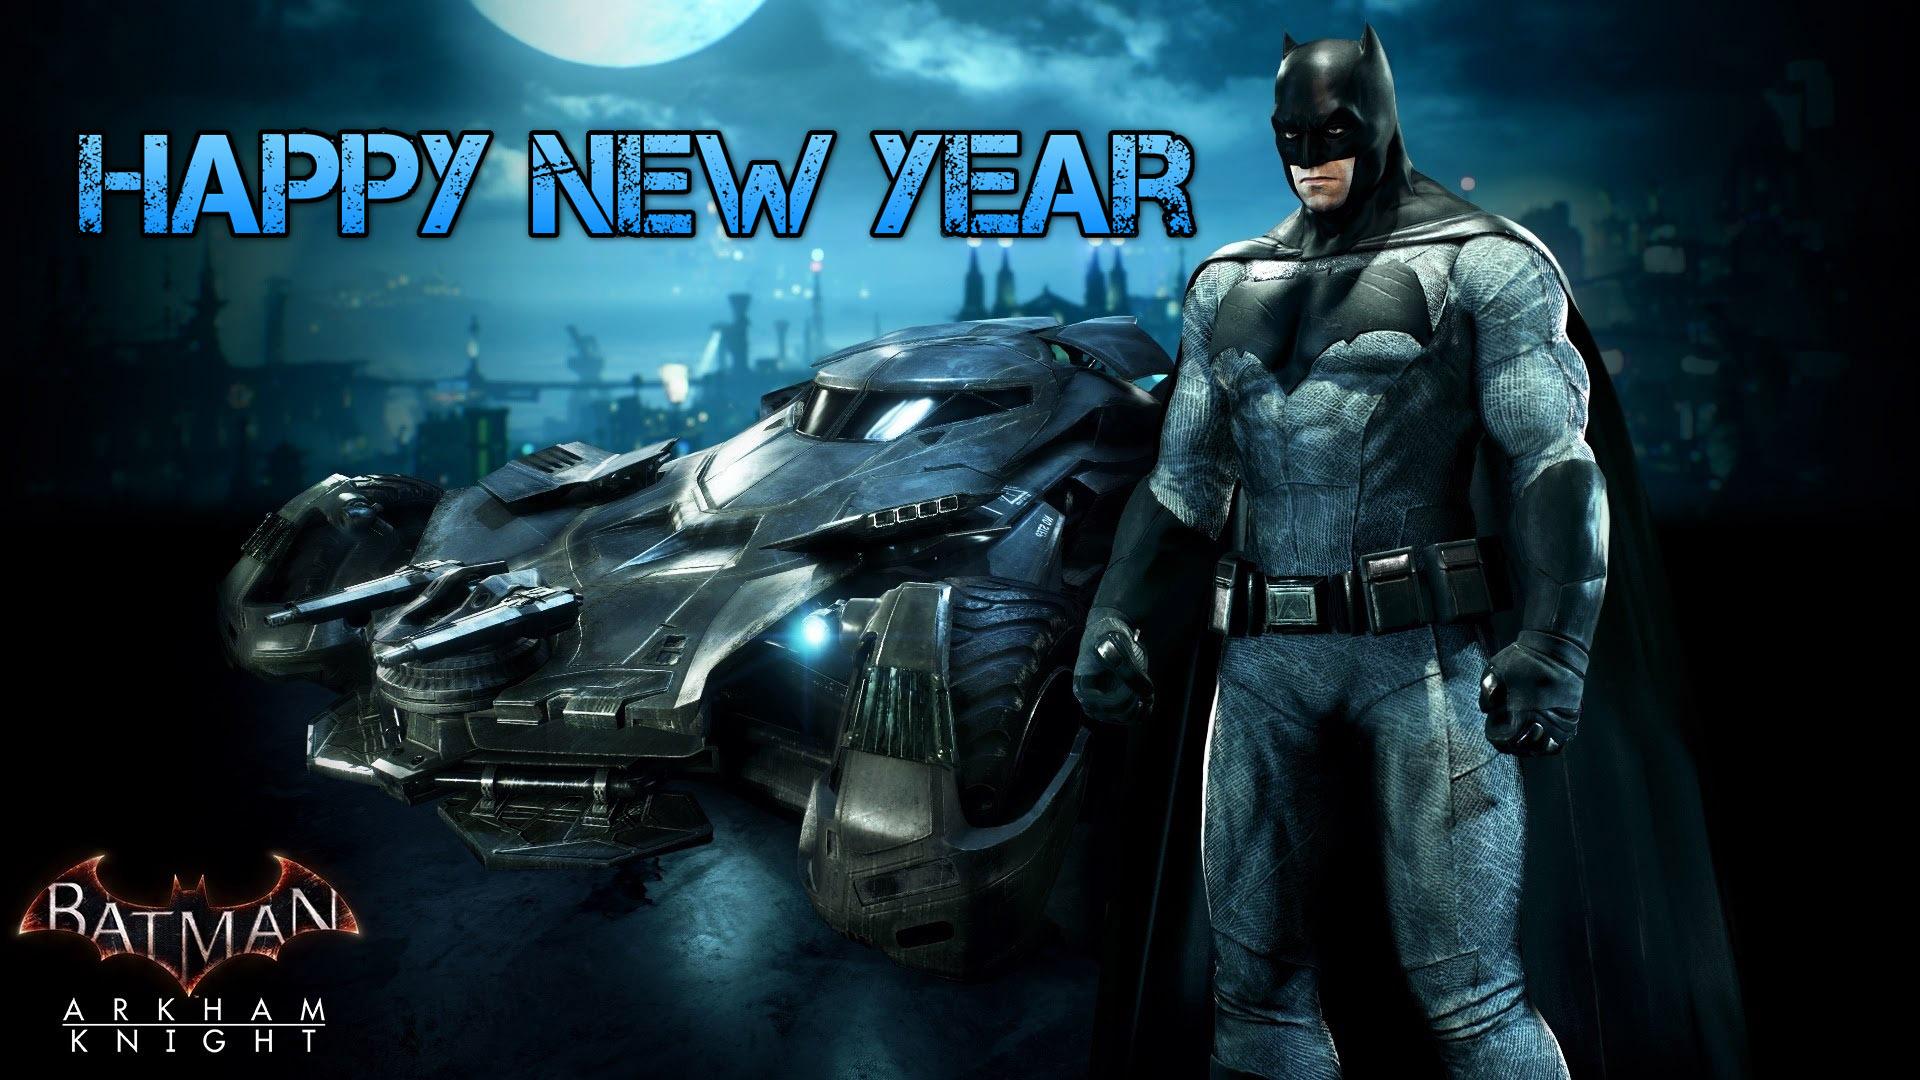 happy new year greetings super hero batman kids hd wallpaper